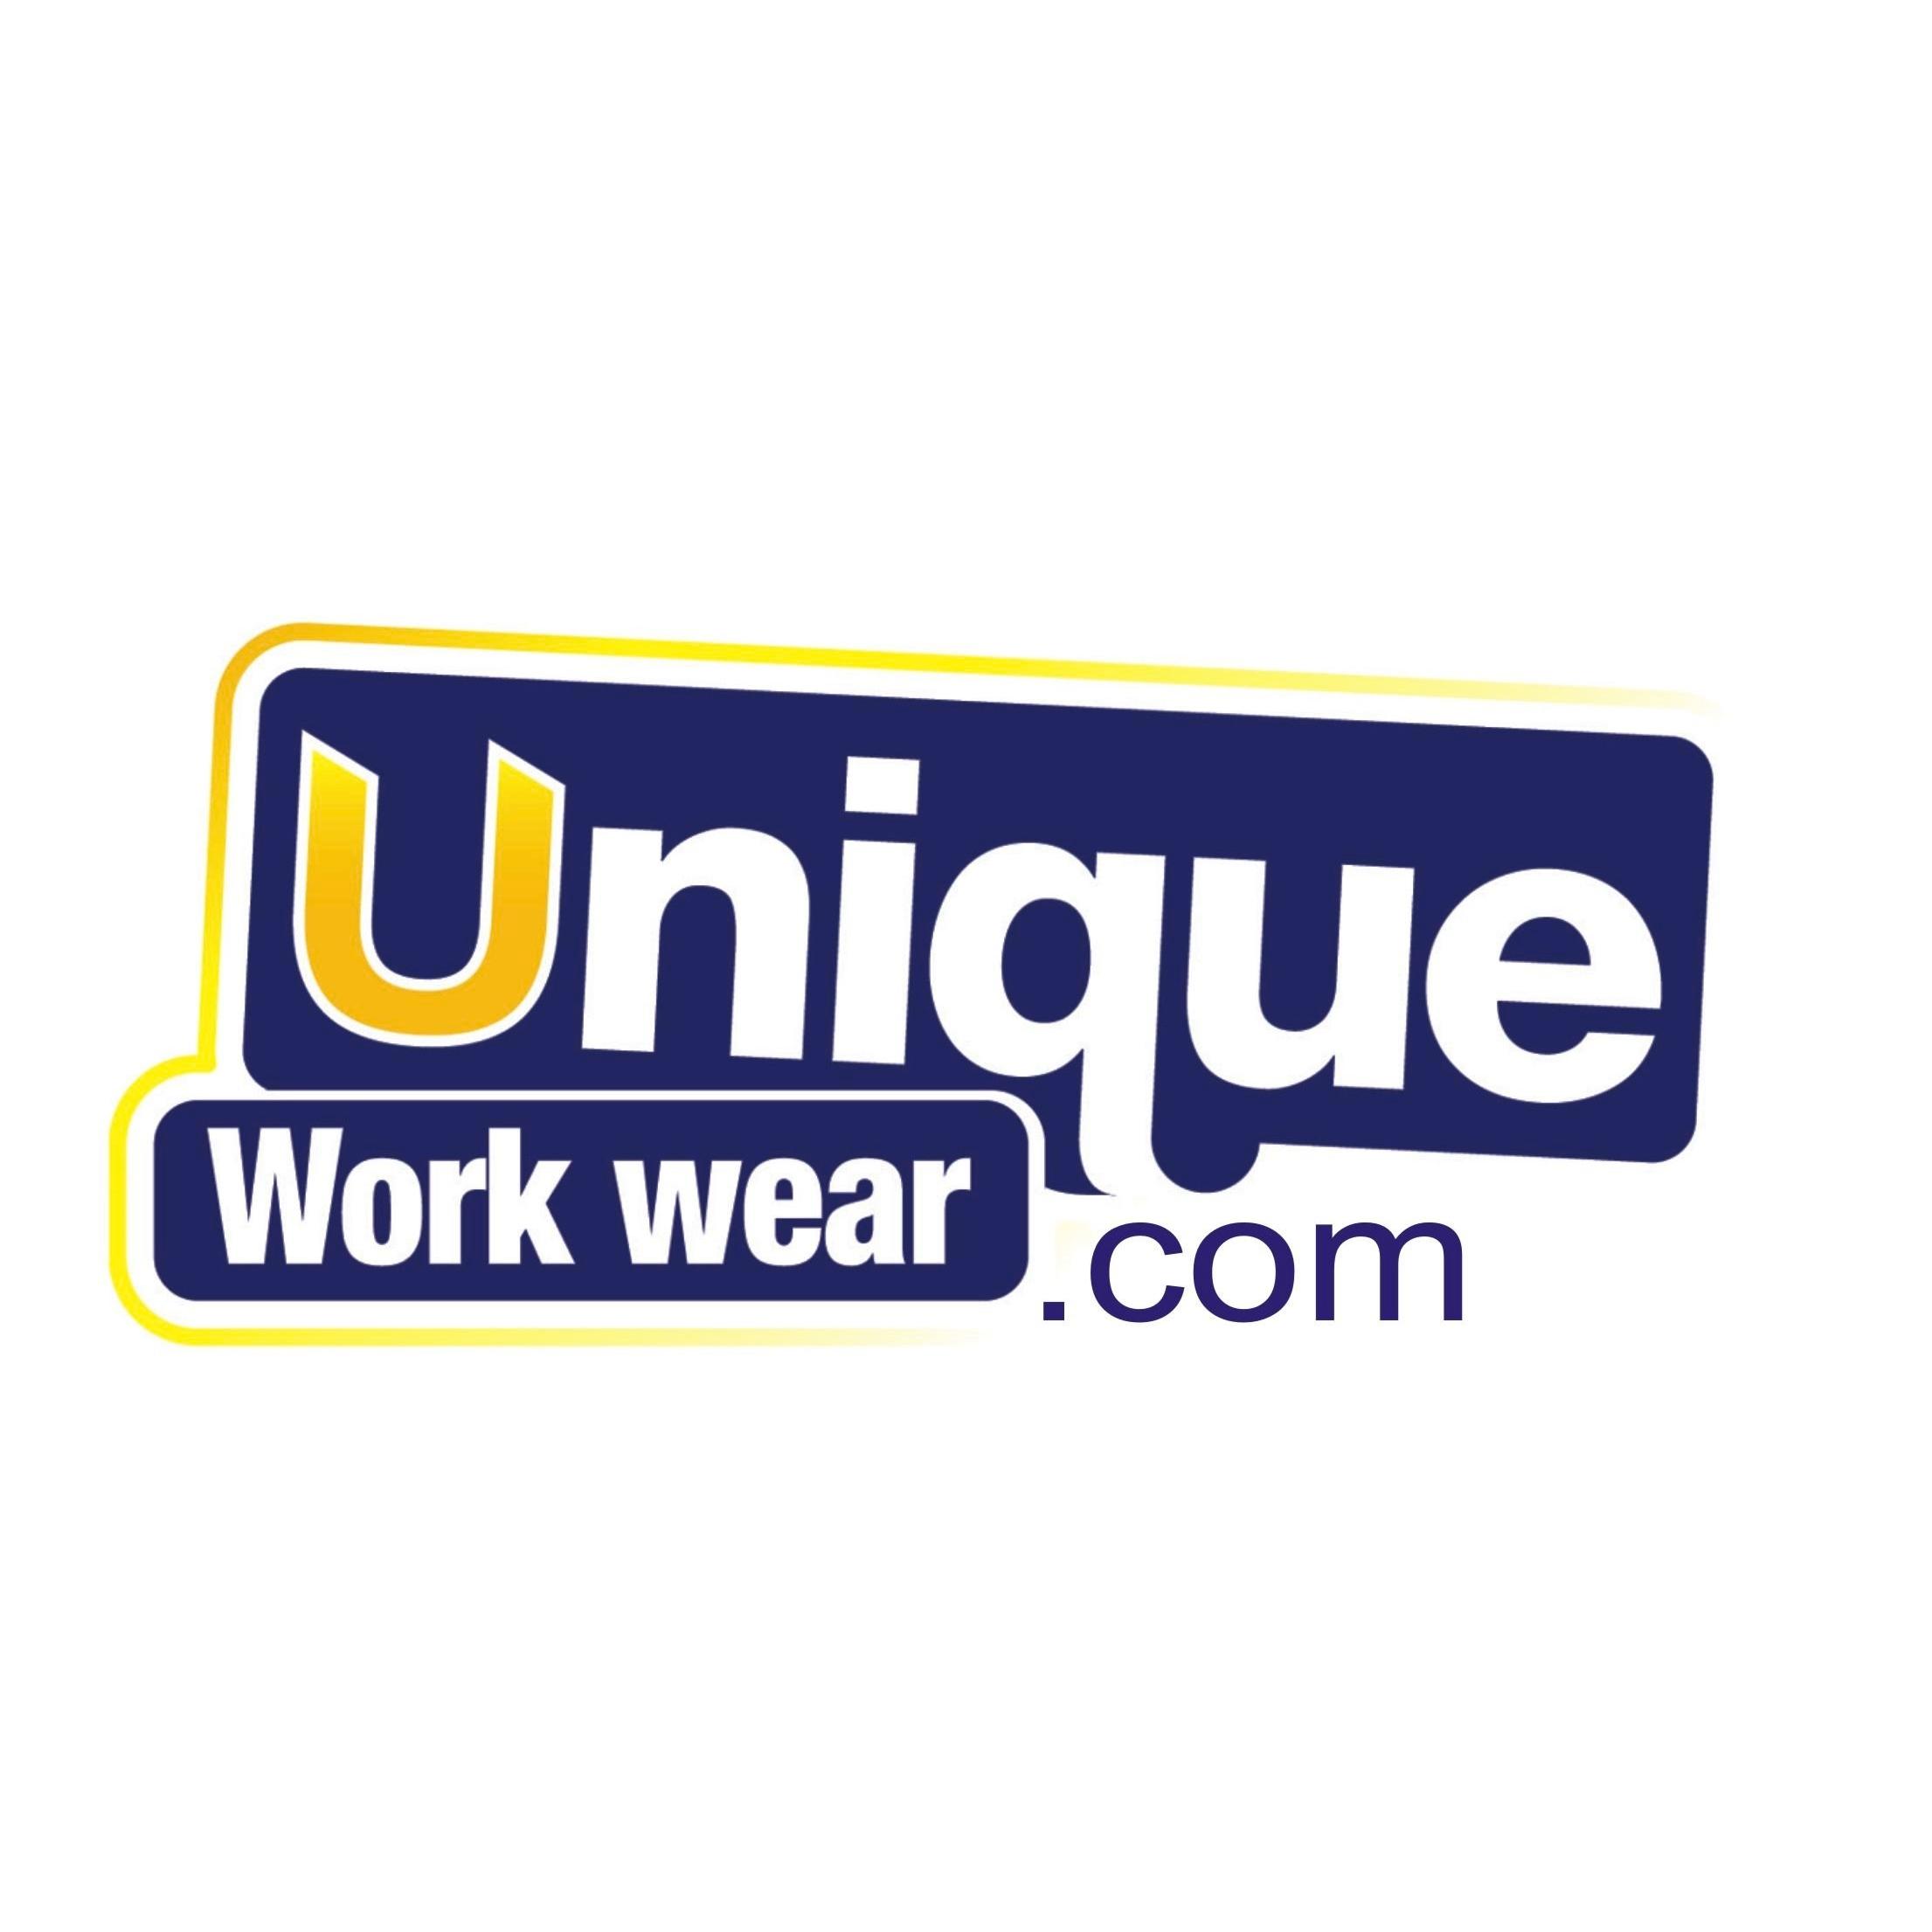 Unique Workwear Printing & Embroidery - Bognor Regis, West Sussex PO21 1PU - 01243 826132 | ShowMeLocal.com